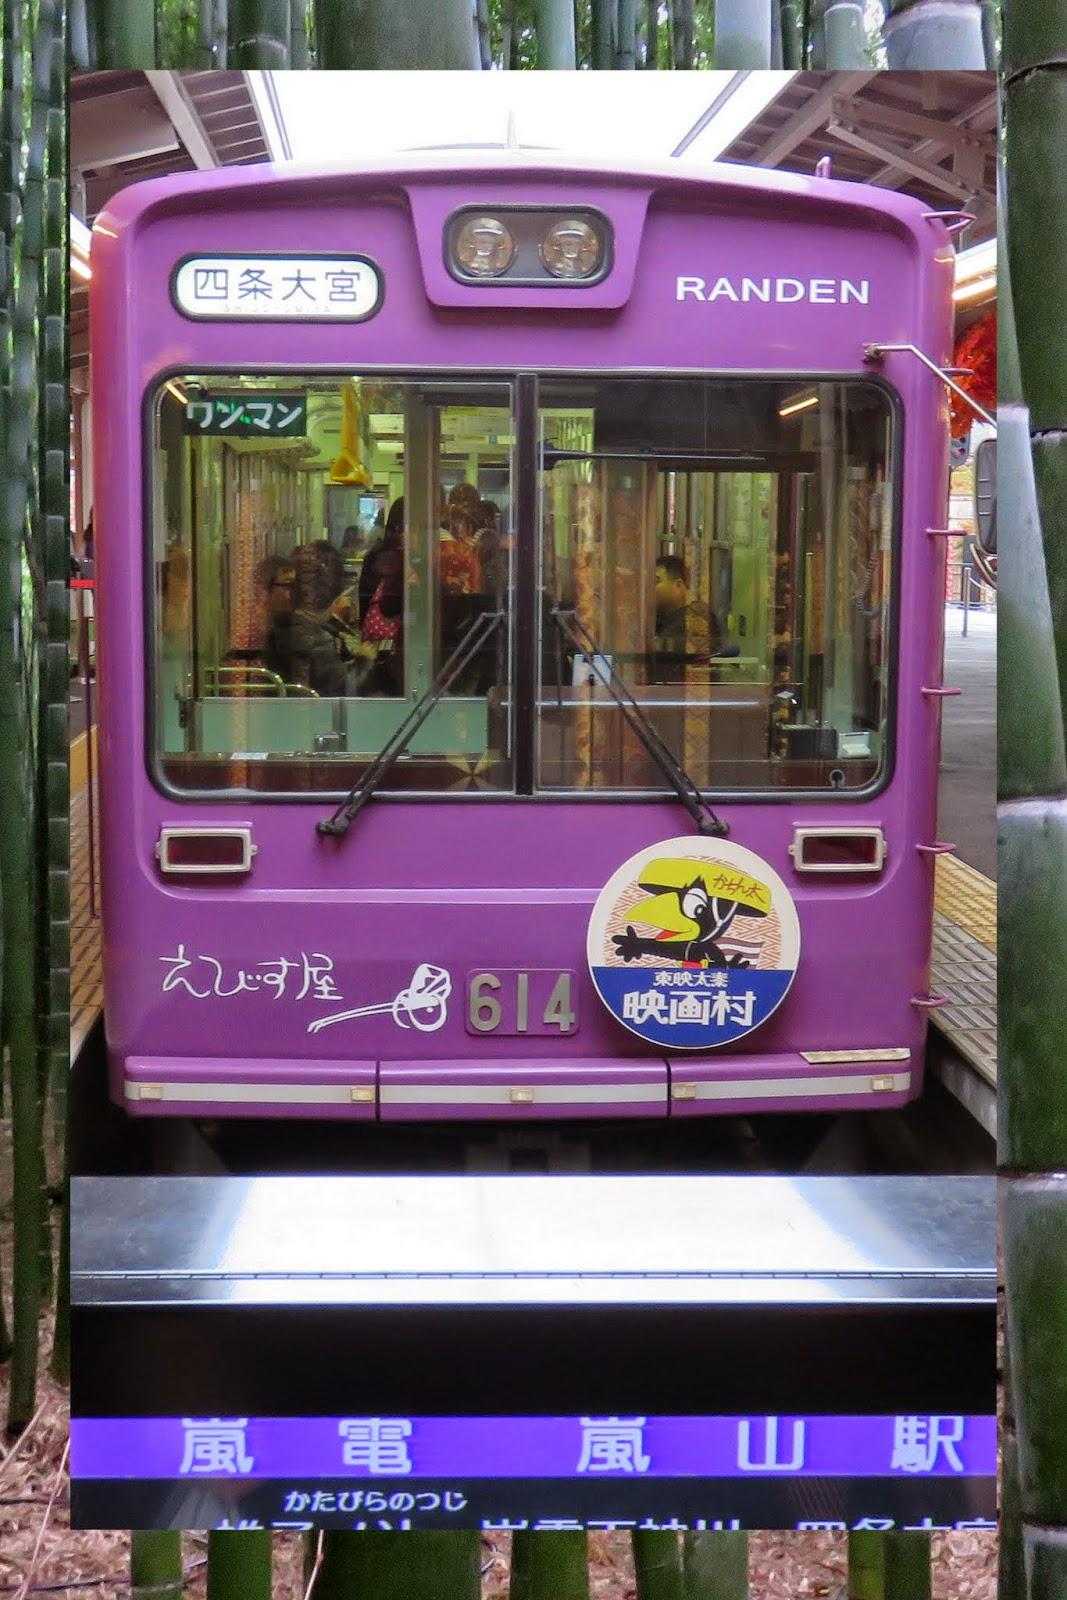 Randen Street Car - Kyoto, Japan